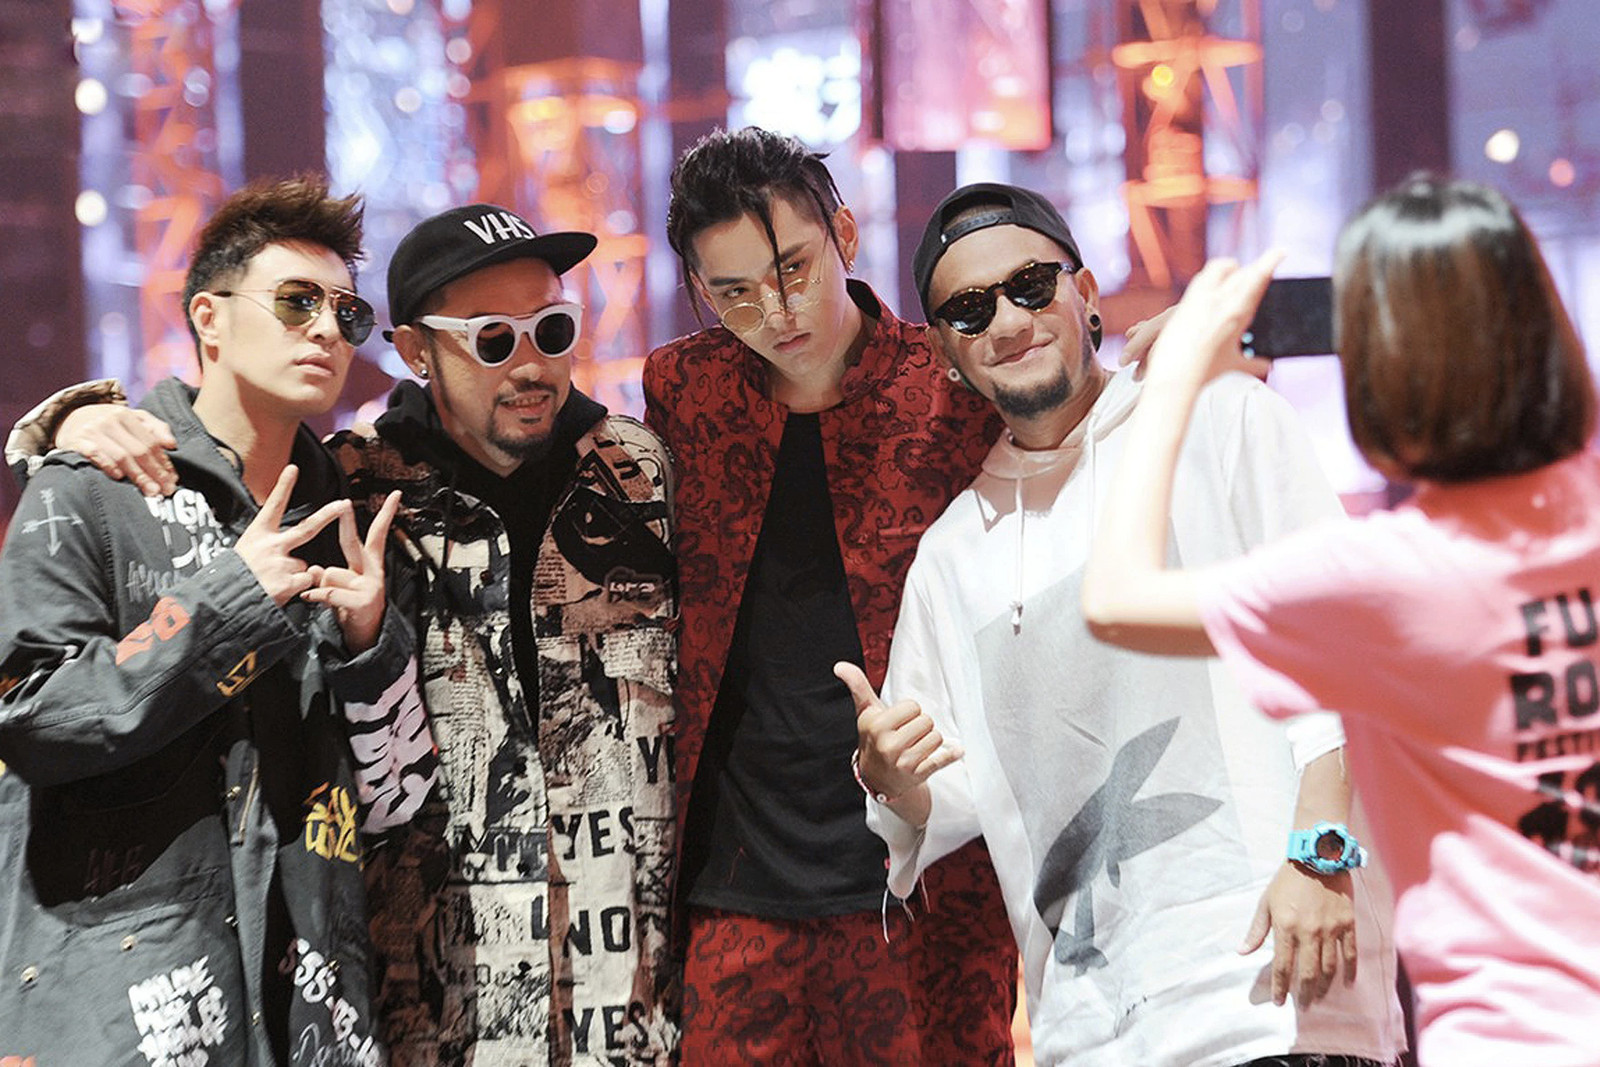 China Hip hop Rap Ban Response Tizzy T Bohan Phonix Doughboy Allyson Toy